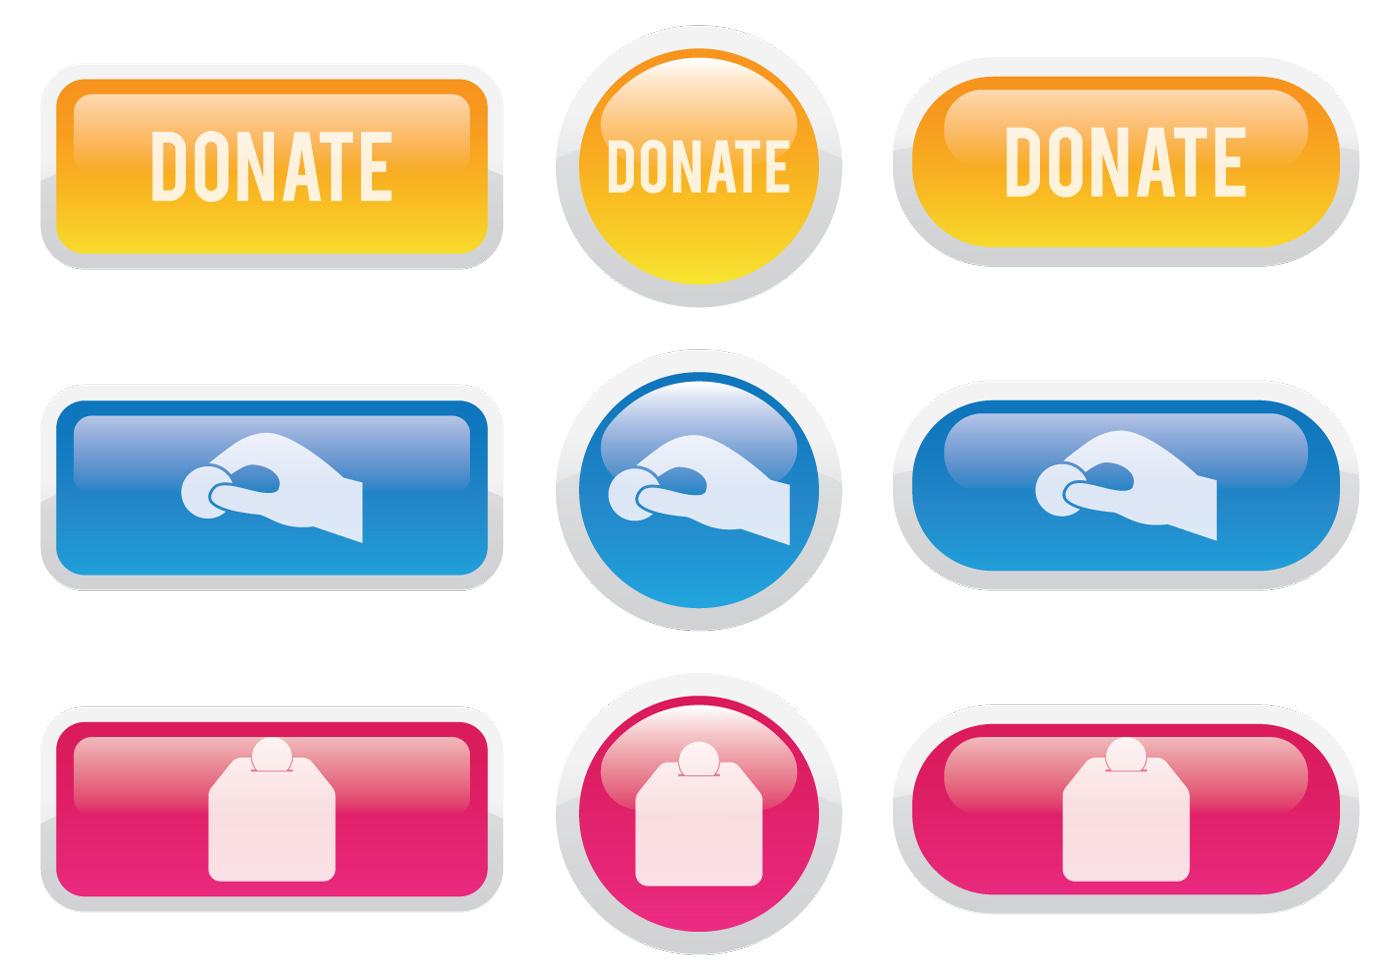 Buttons Free Vector Art - (25722 Free Downloads)